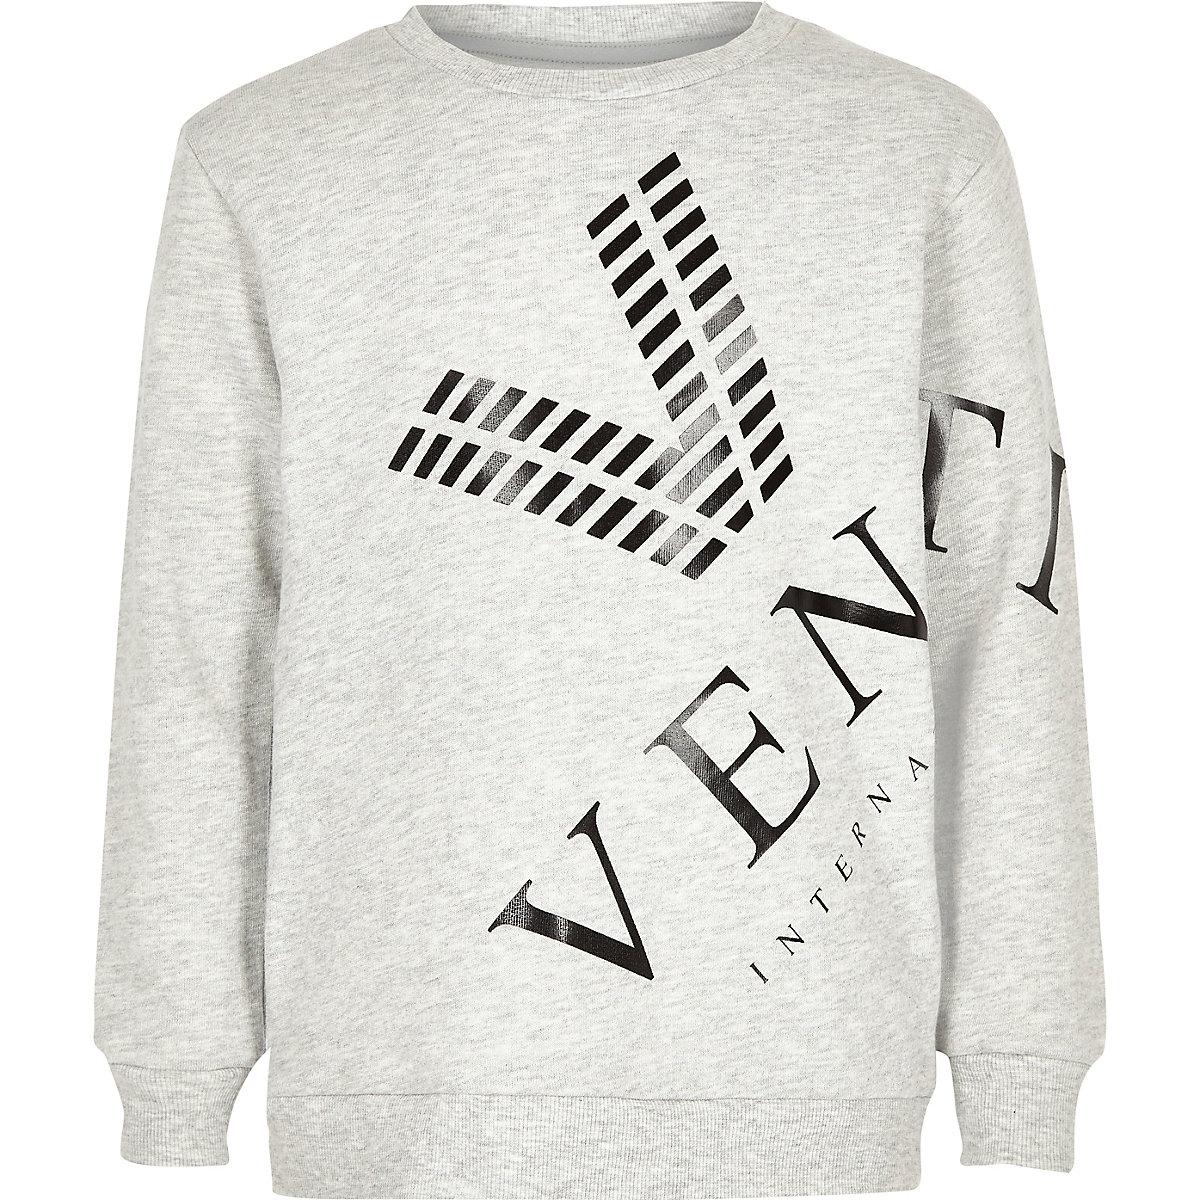 Boys grey marl venti print sweatshirt